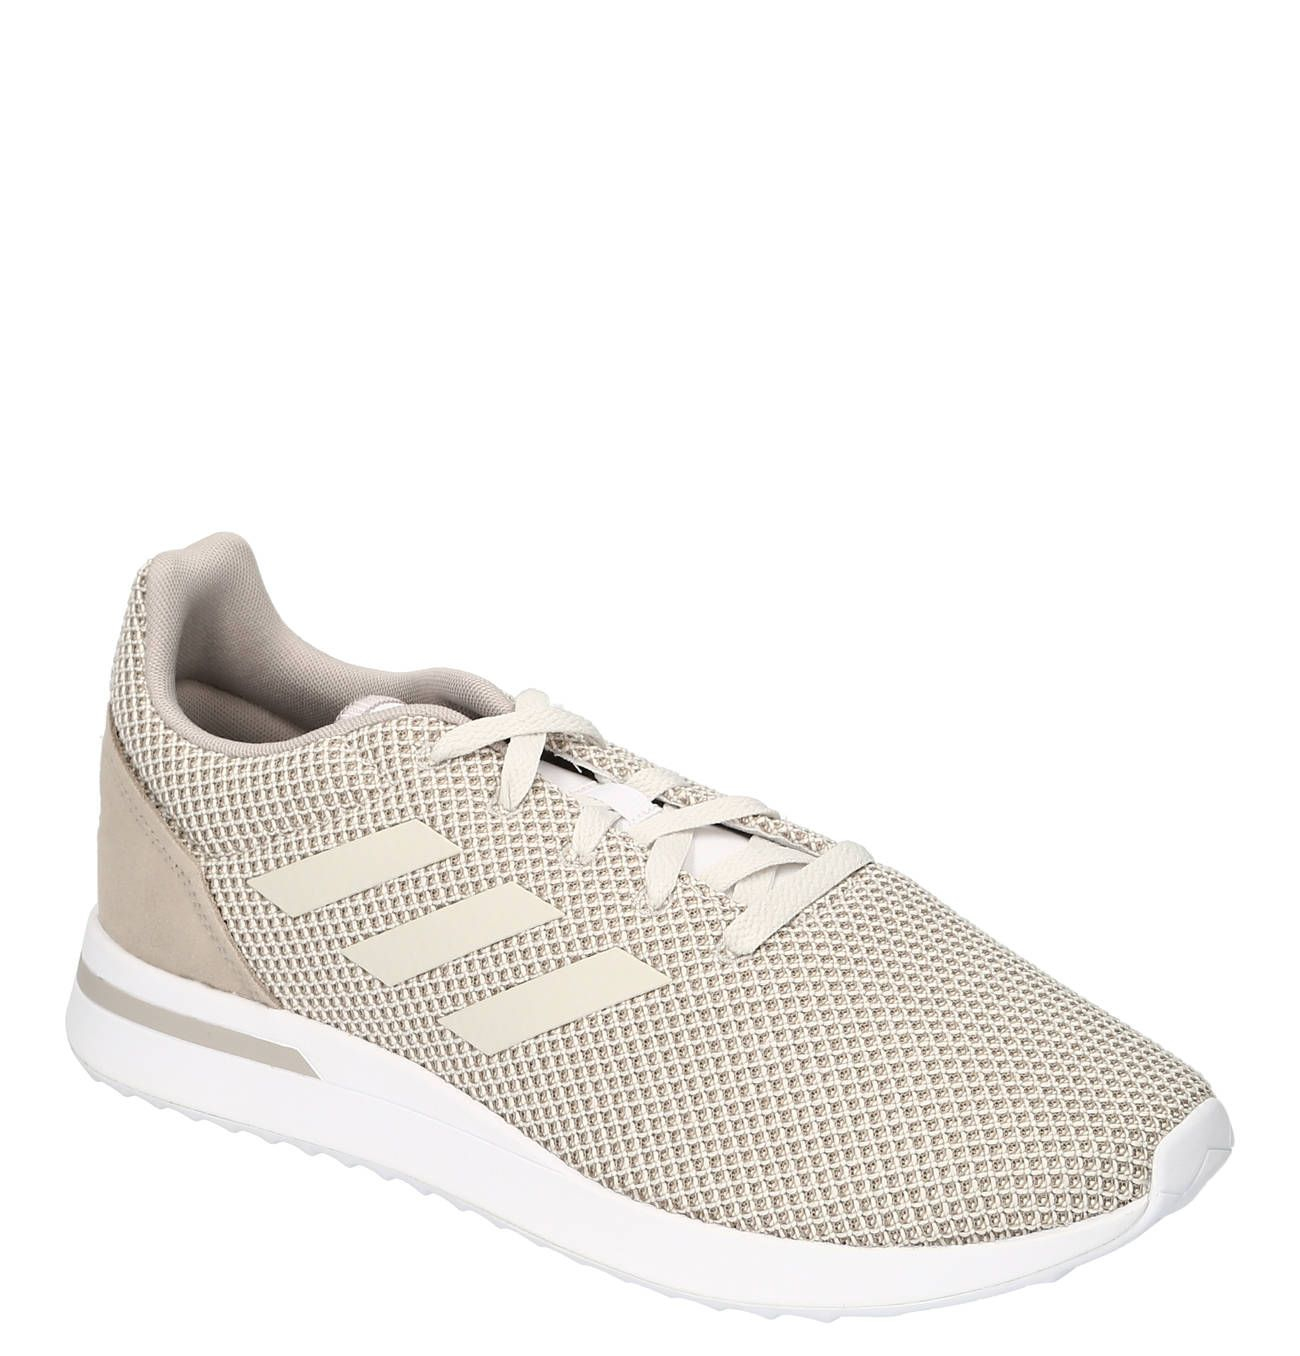 Sneaker, Knit Optik, Marken Prägung, Ortholite Float, für